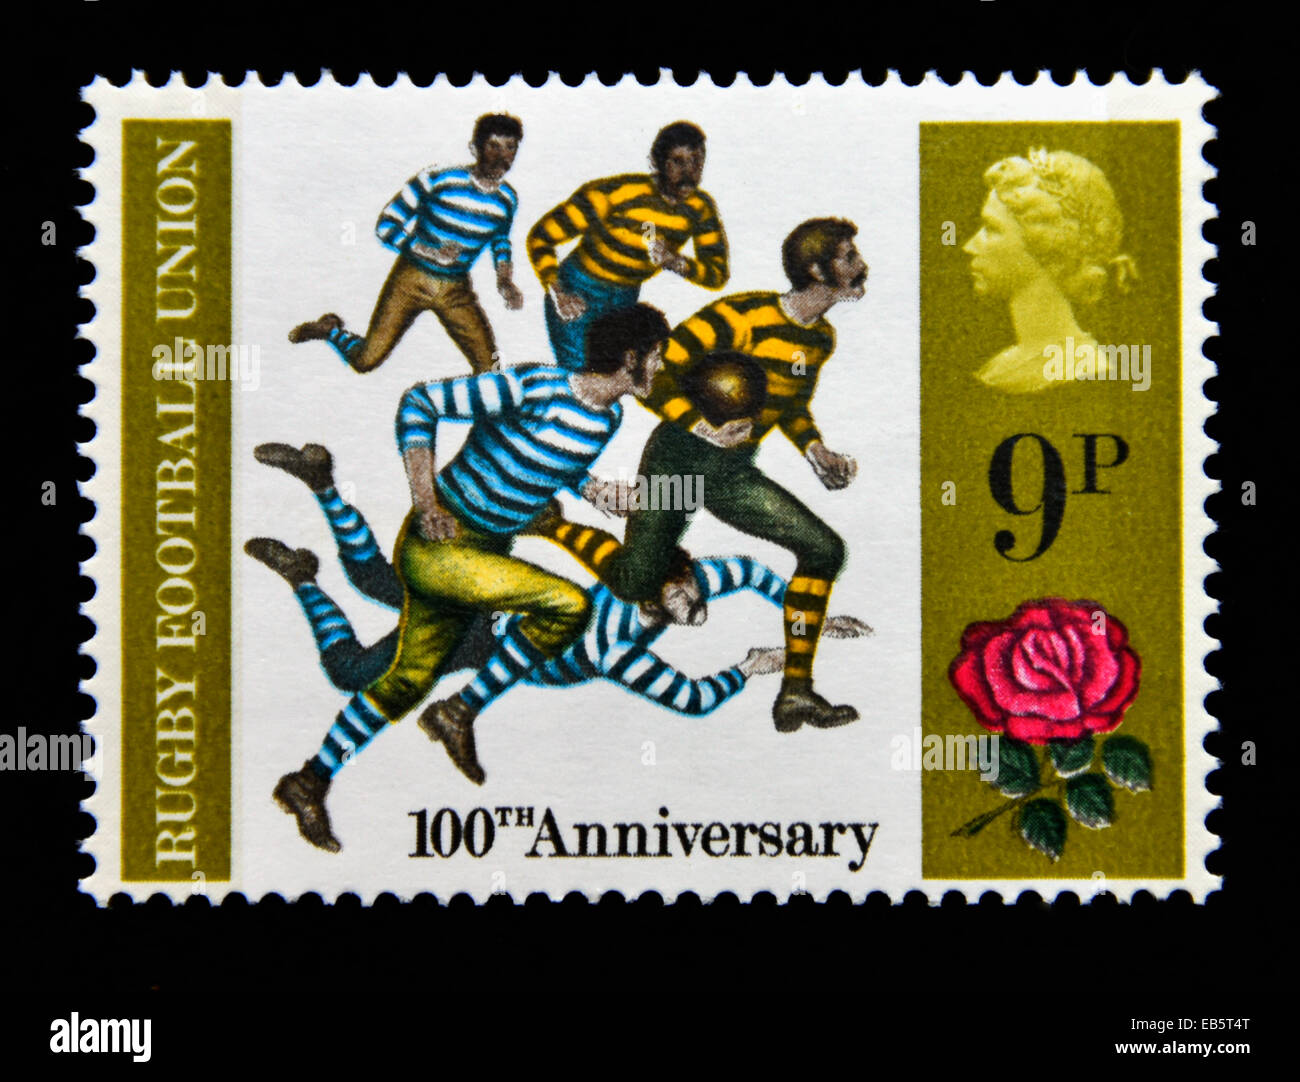 Postage stamp. Great Britain. Queen Elizabeth II. British Anniversaries. 1971. Rugby Football Union, 100th. Anniversary. - Stock Image